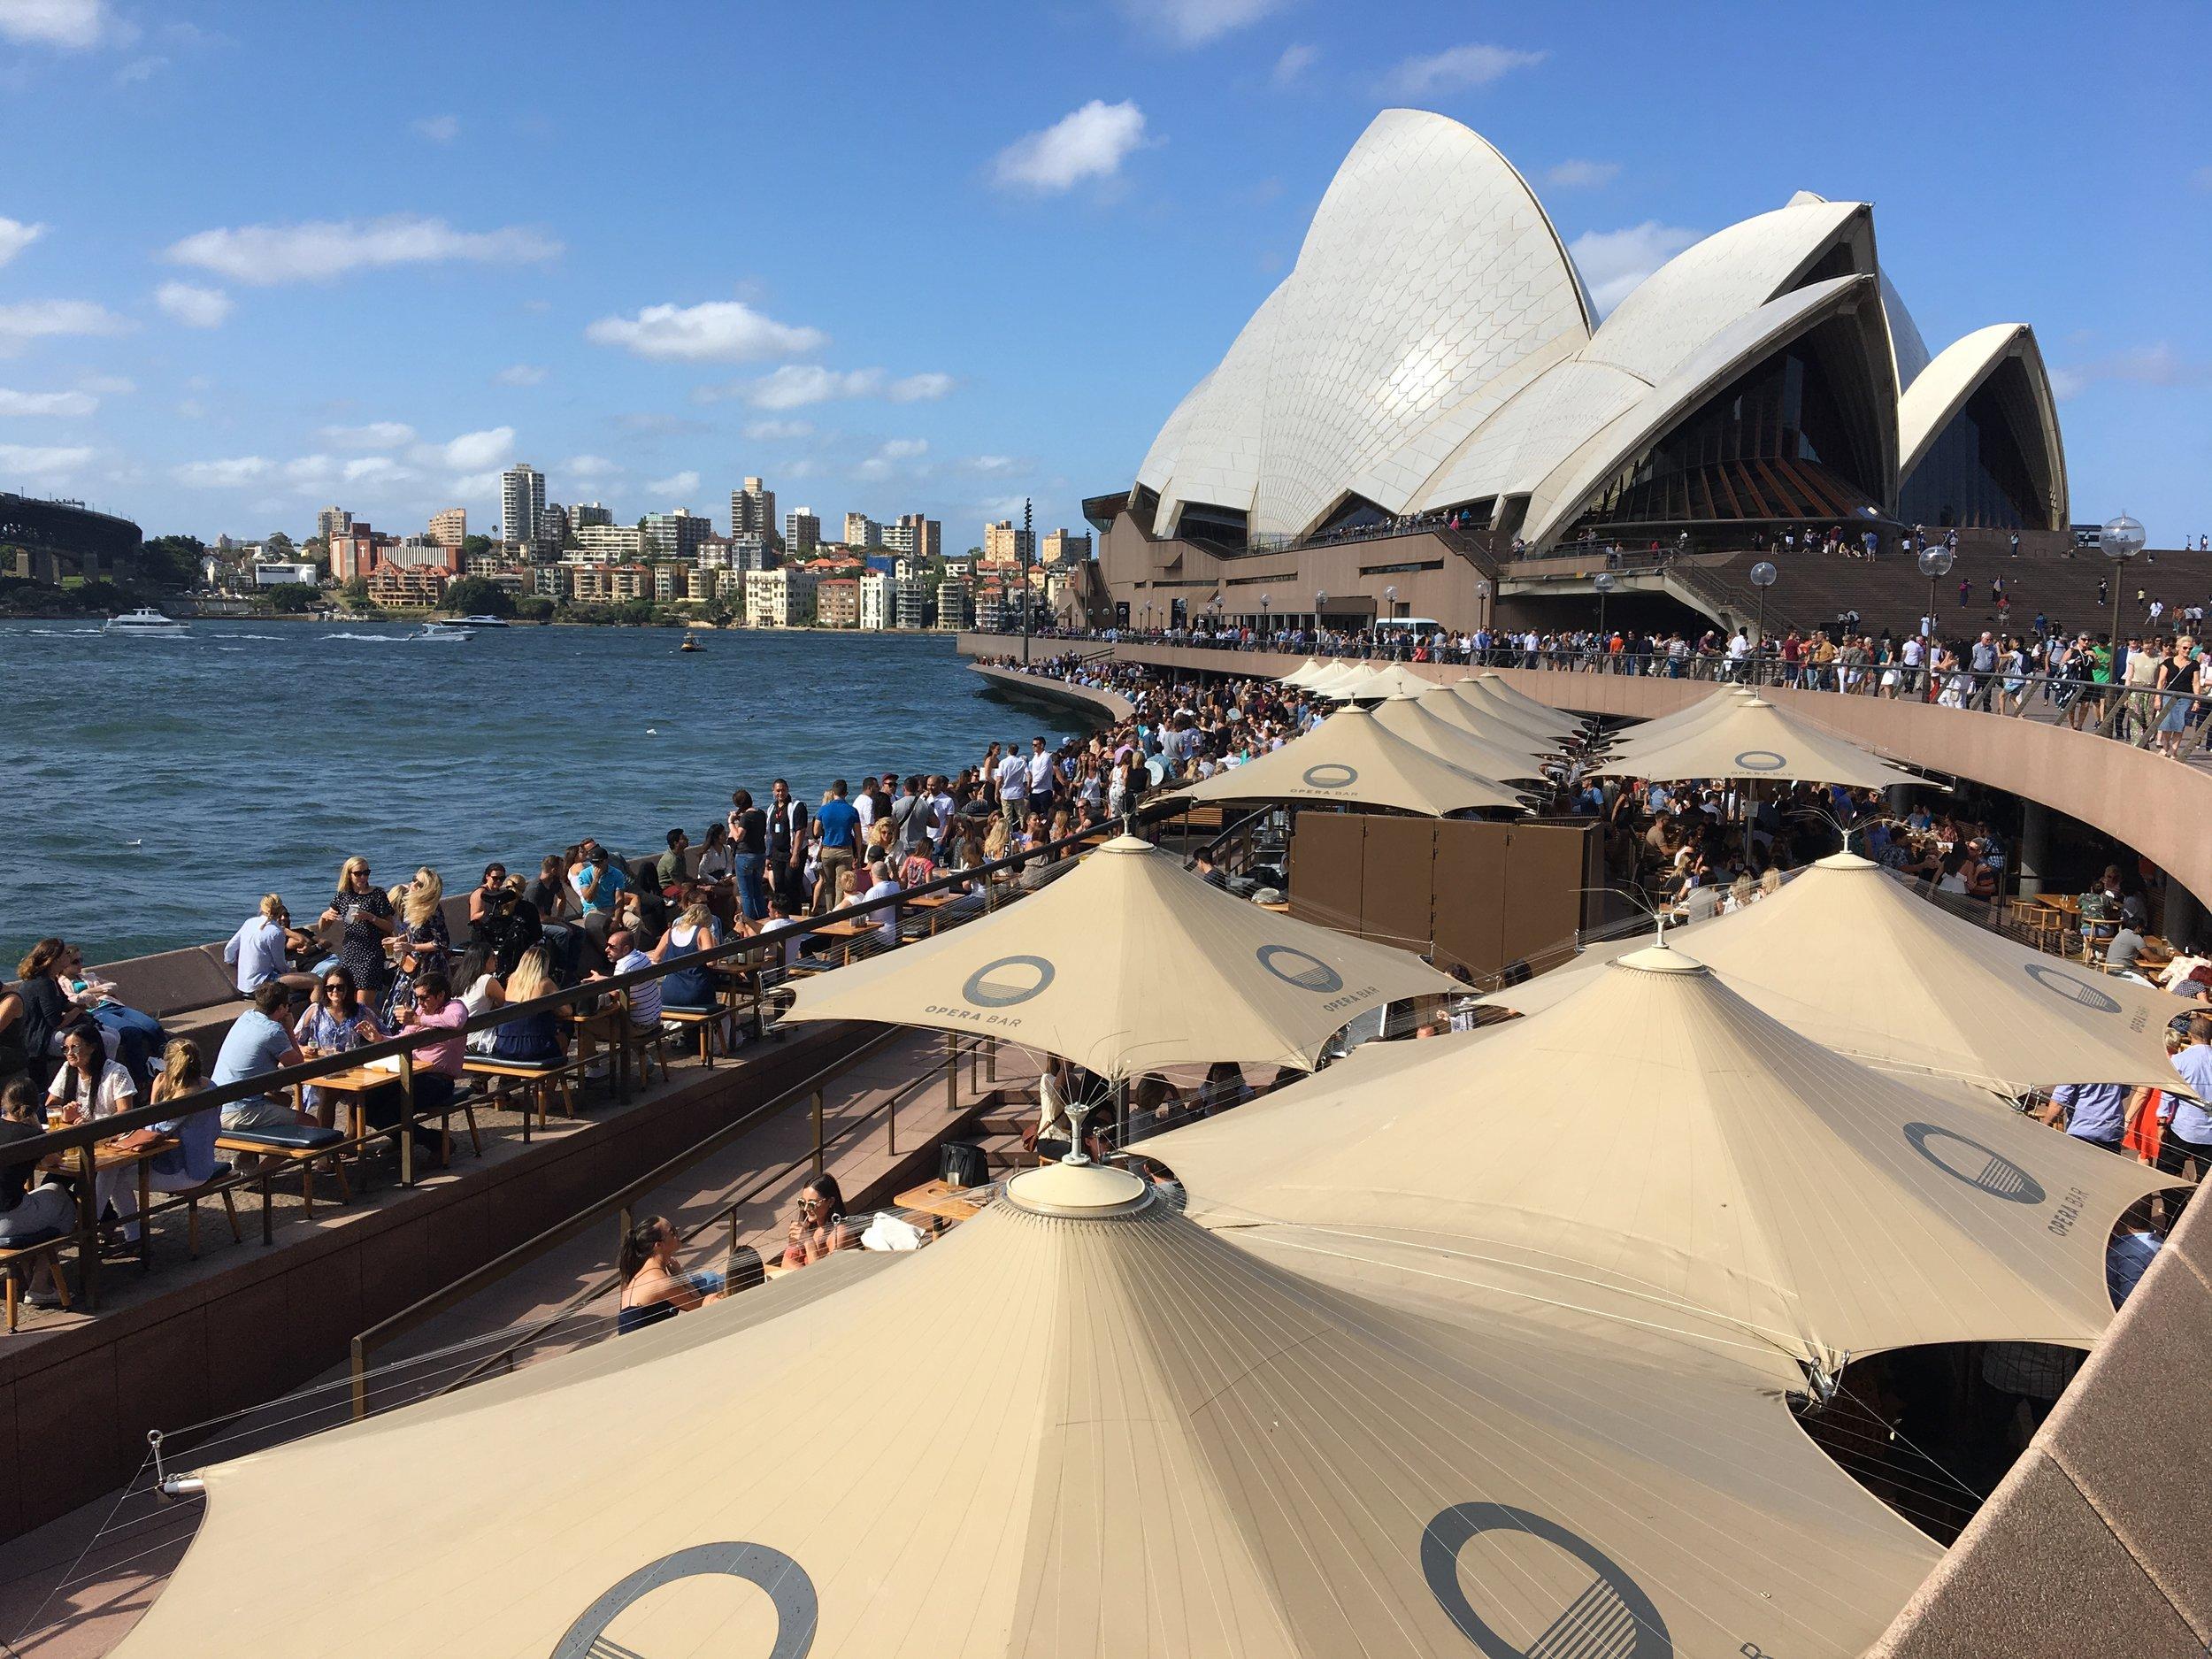 USE 40,000 AADVANTAGE MILES FOR A ONE-WAY TRIP TO SYDNEY, AUSTRALIA